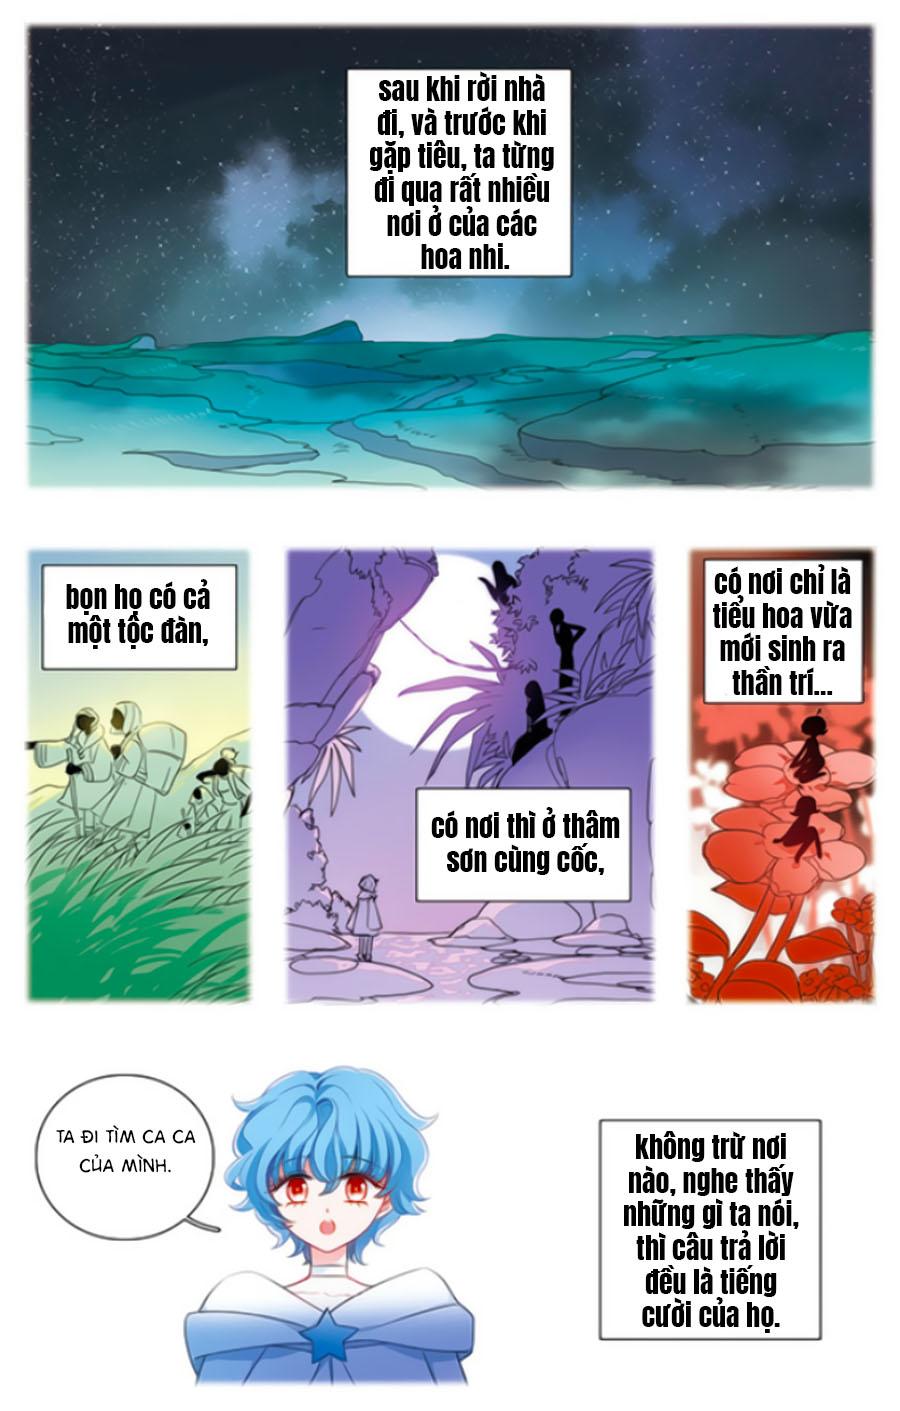 Tinh Linh Tố Chap 13 - Trang 2